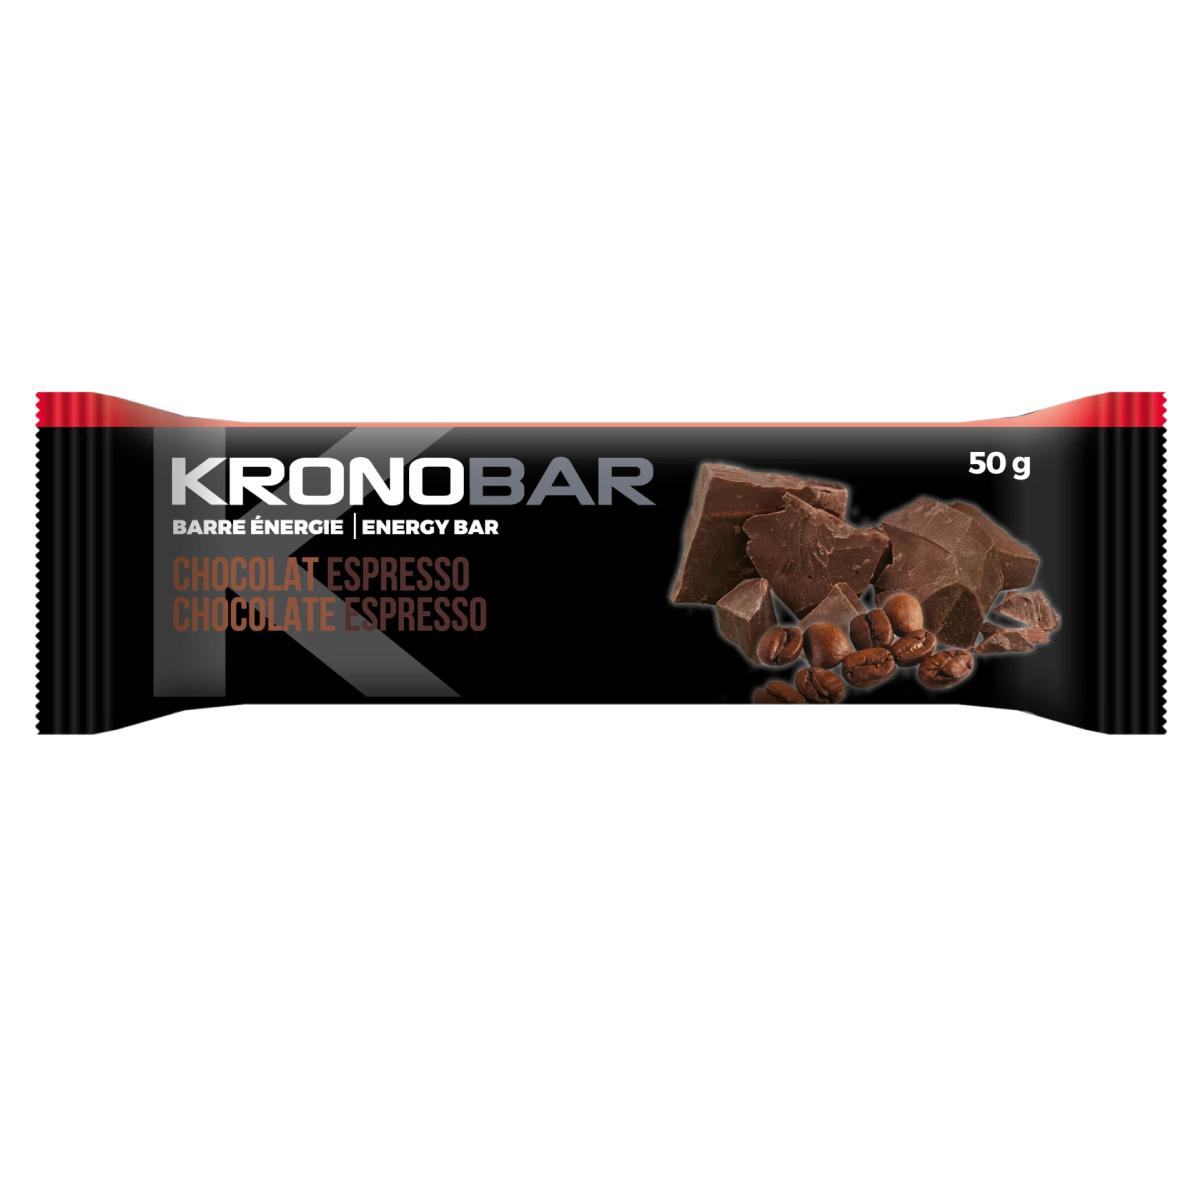 BARRE ENERGETIQUE KRONOBAR CHOCO-ESPRESSO